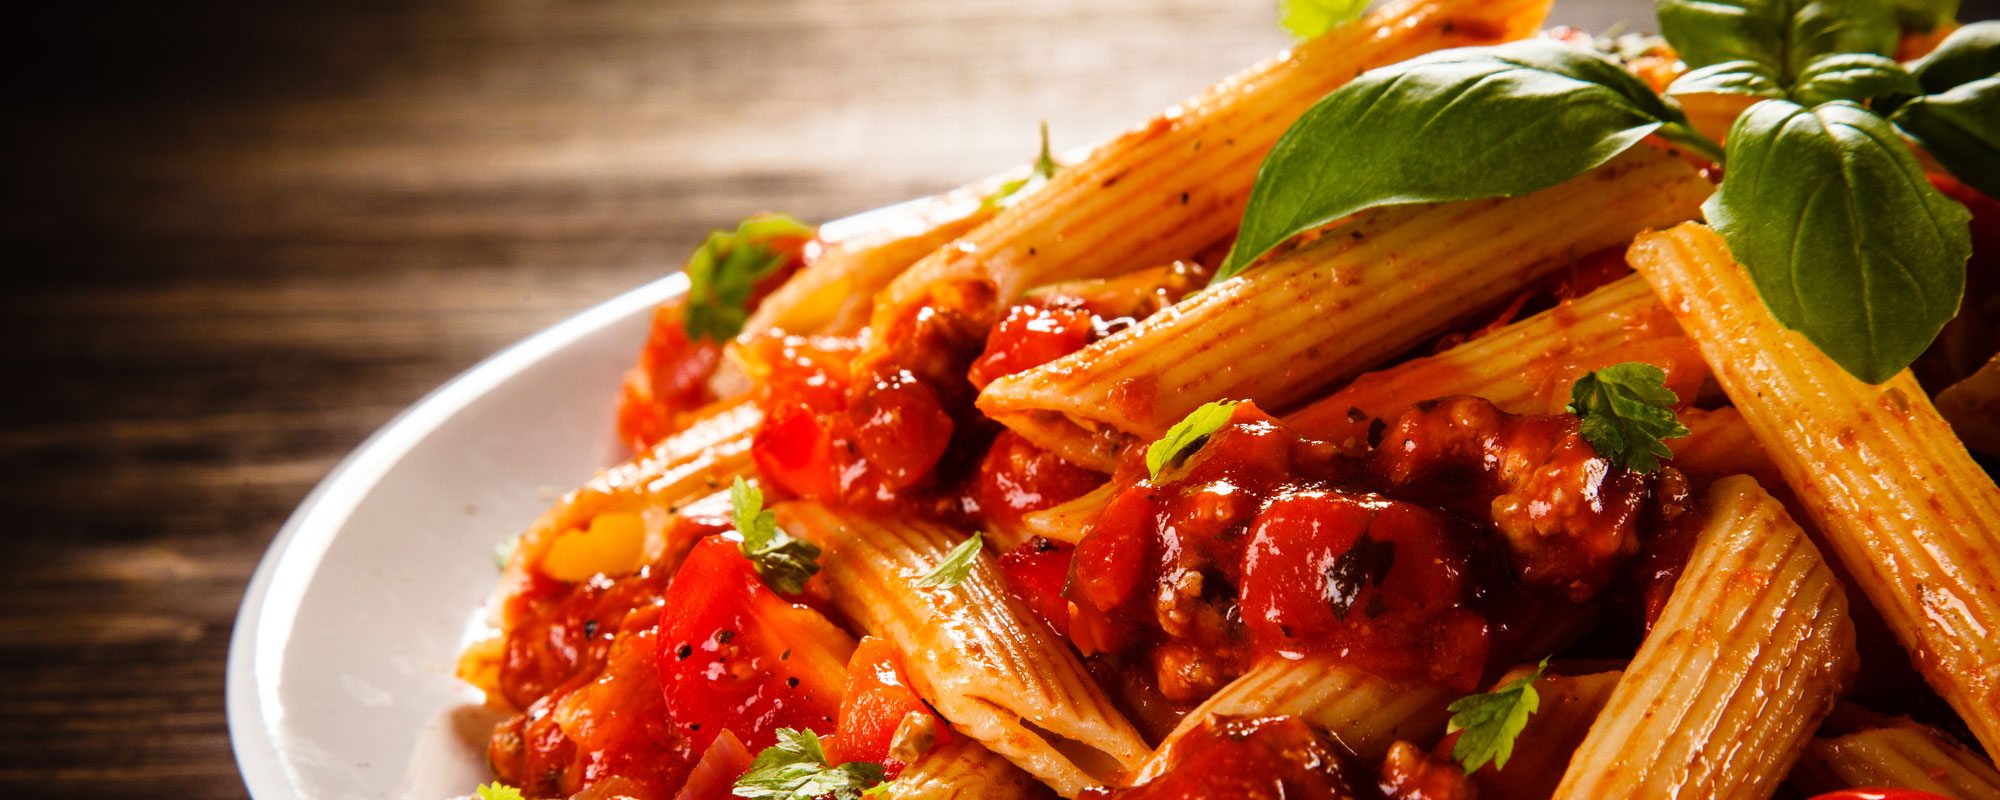 italian restaurants destin fl, pazzo italiano destin